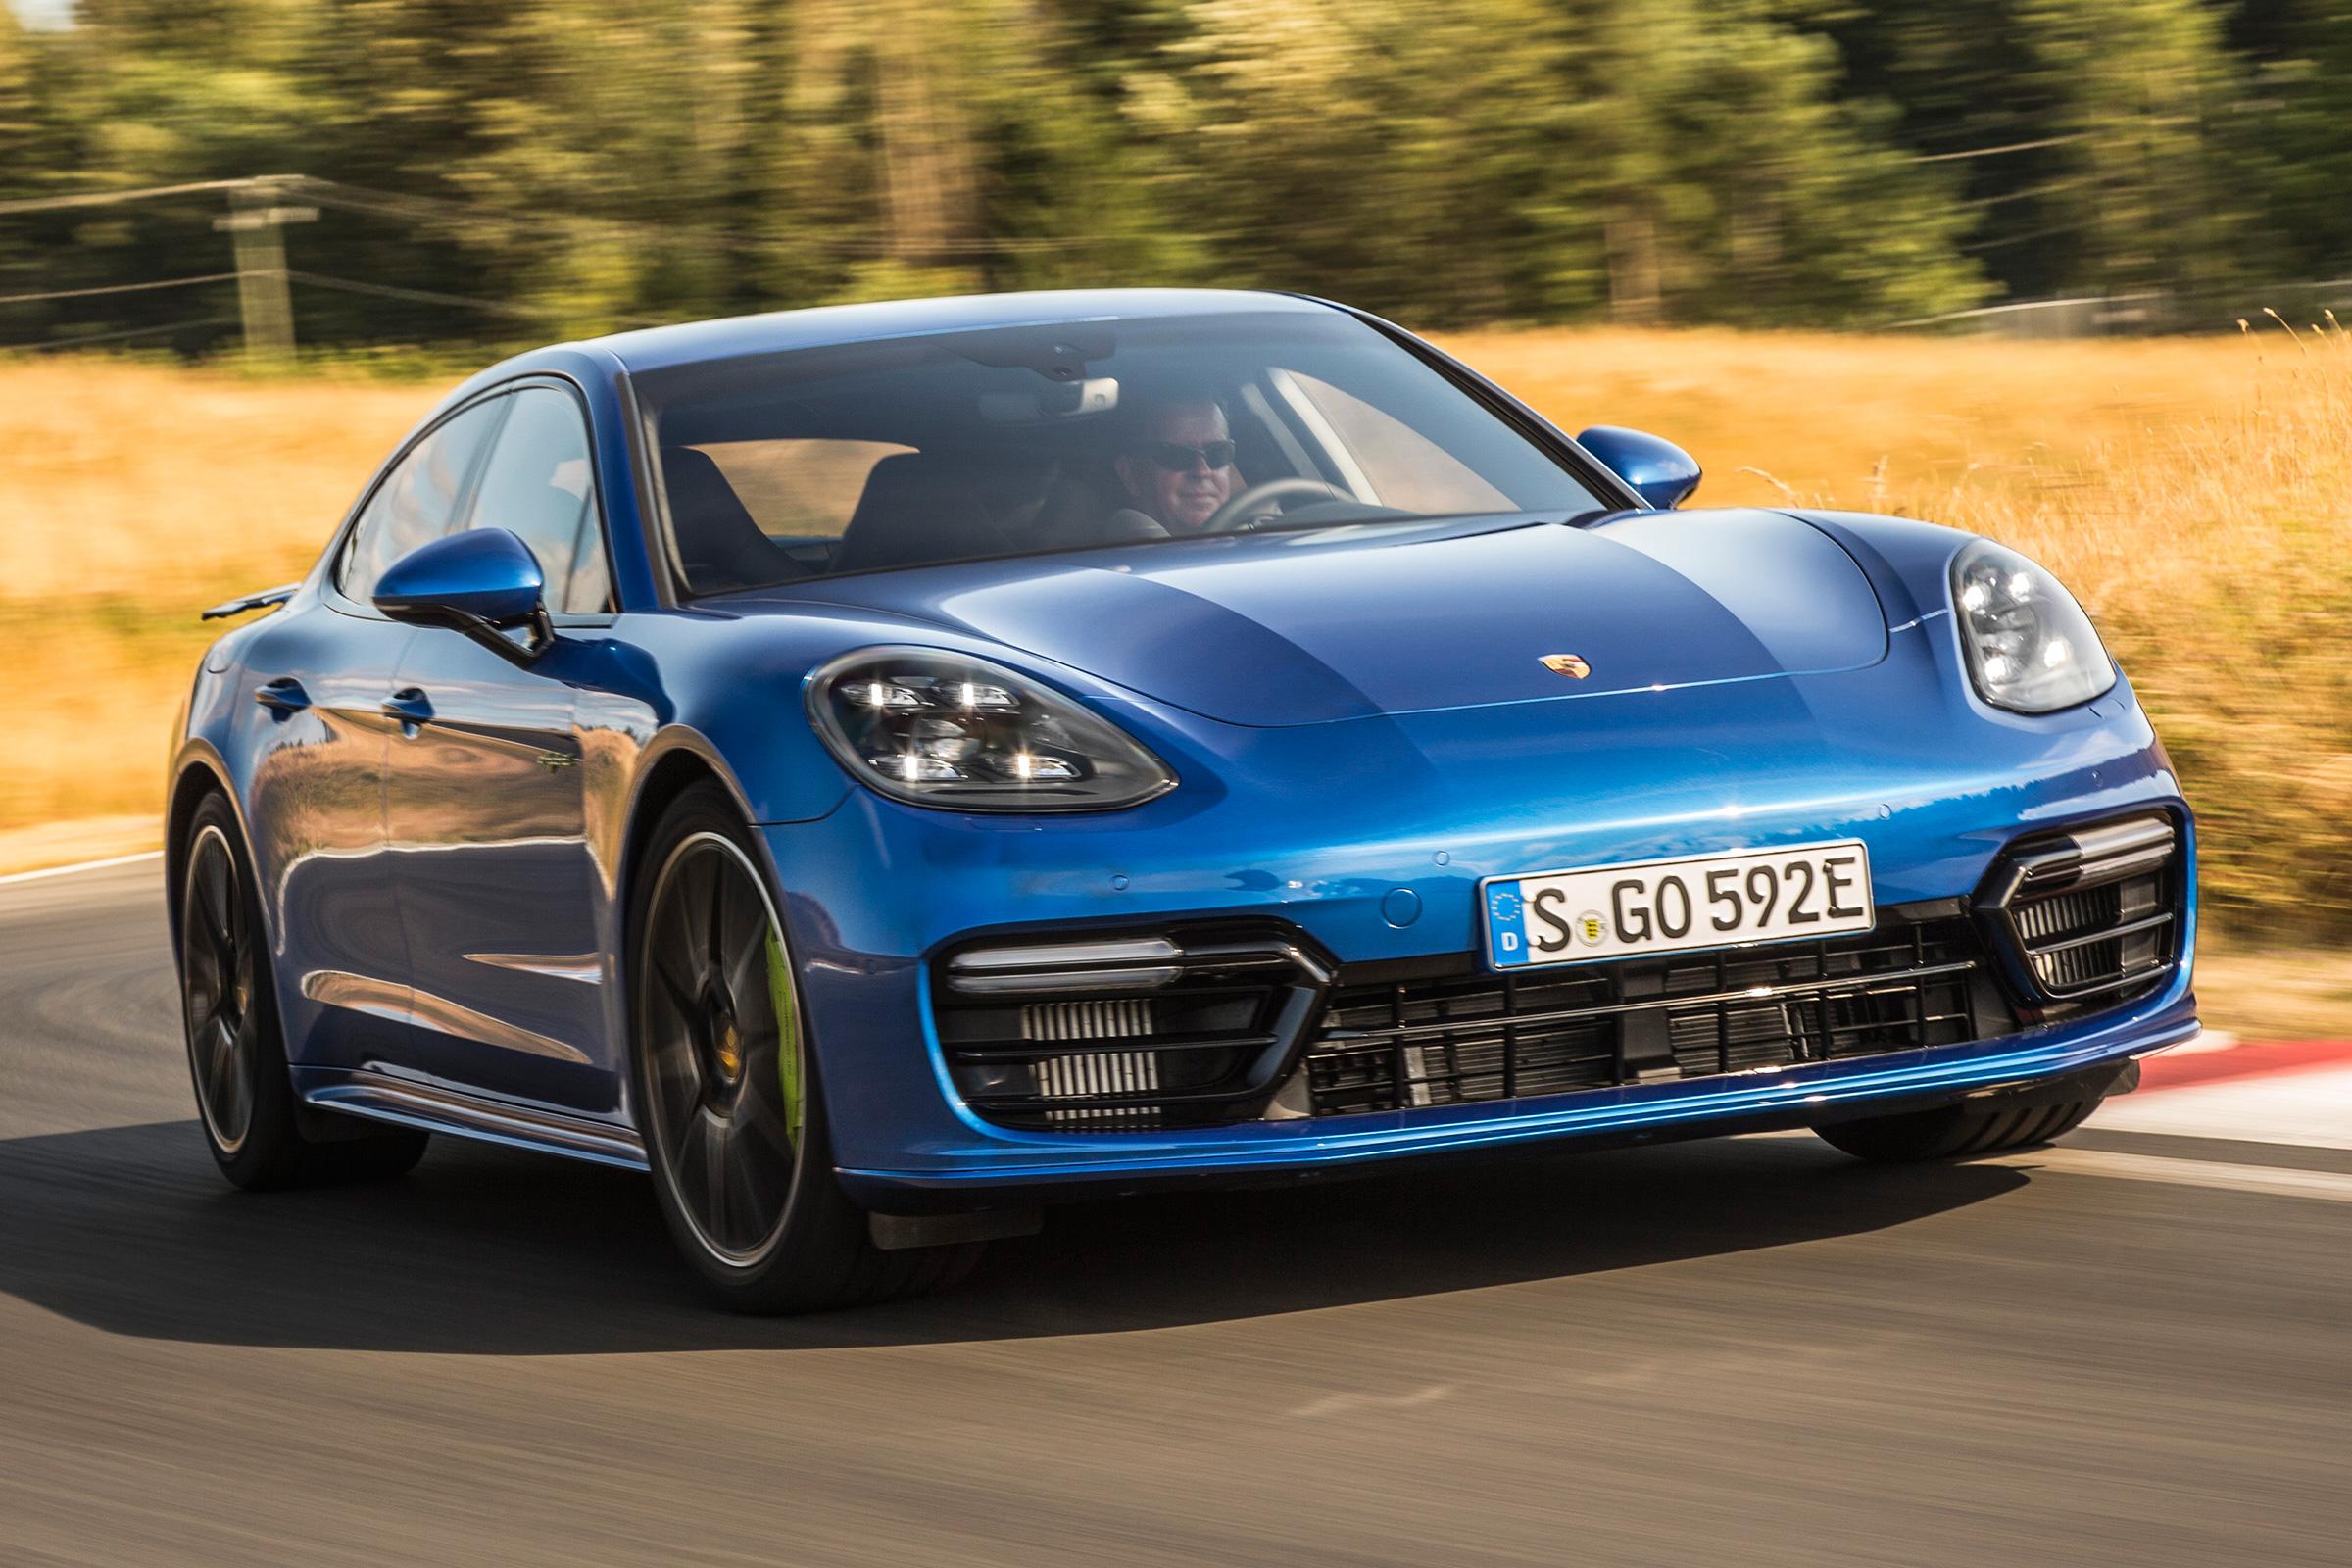 New Porsche Panamera Turbo S E Hybrid 2017 Review Auto Express